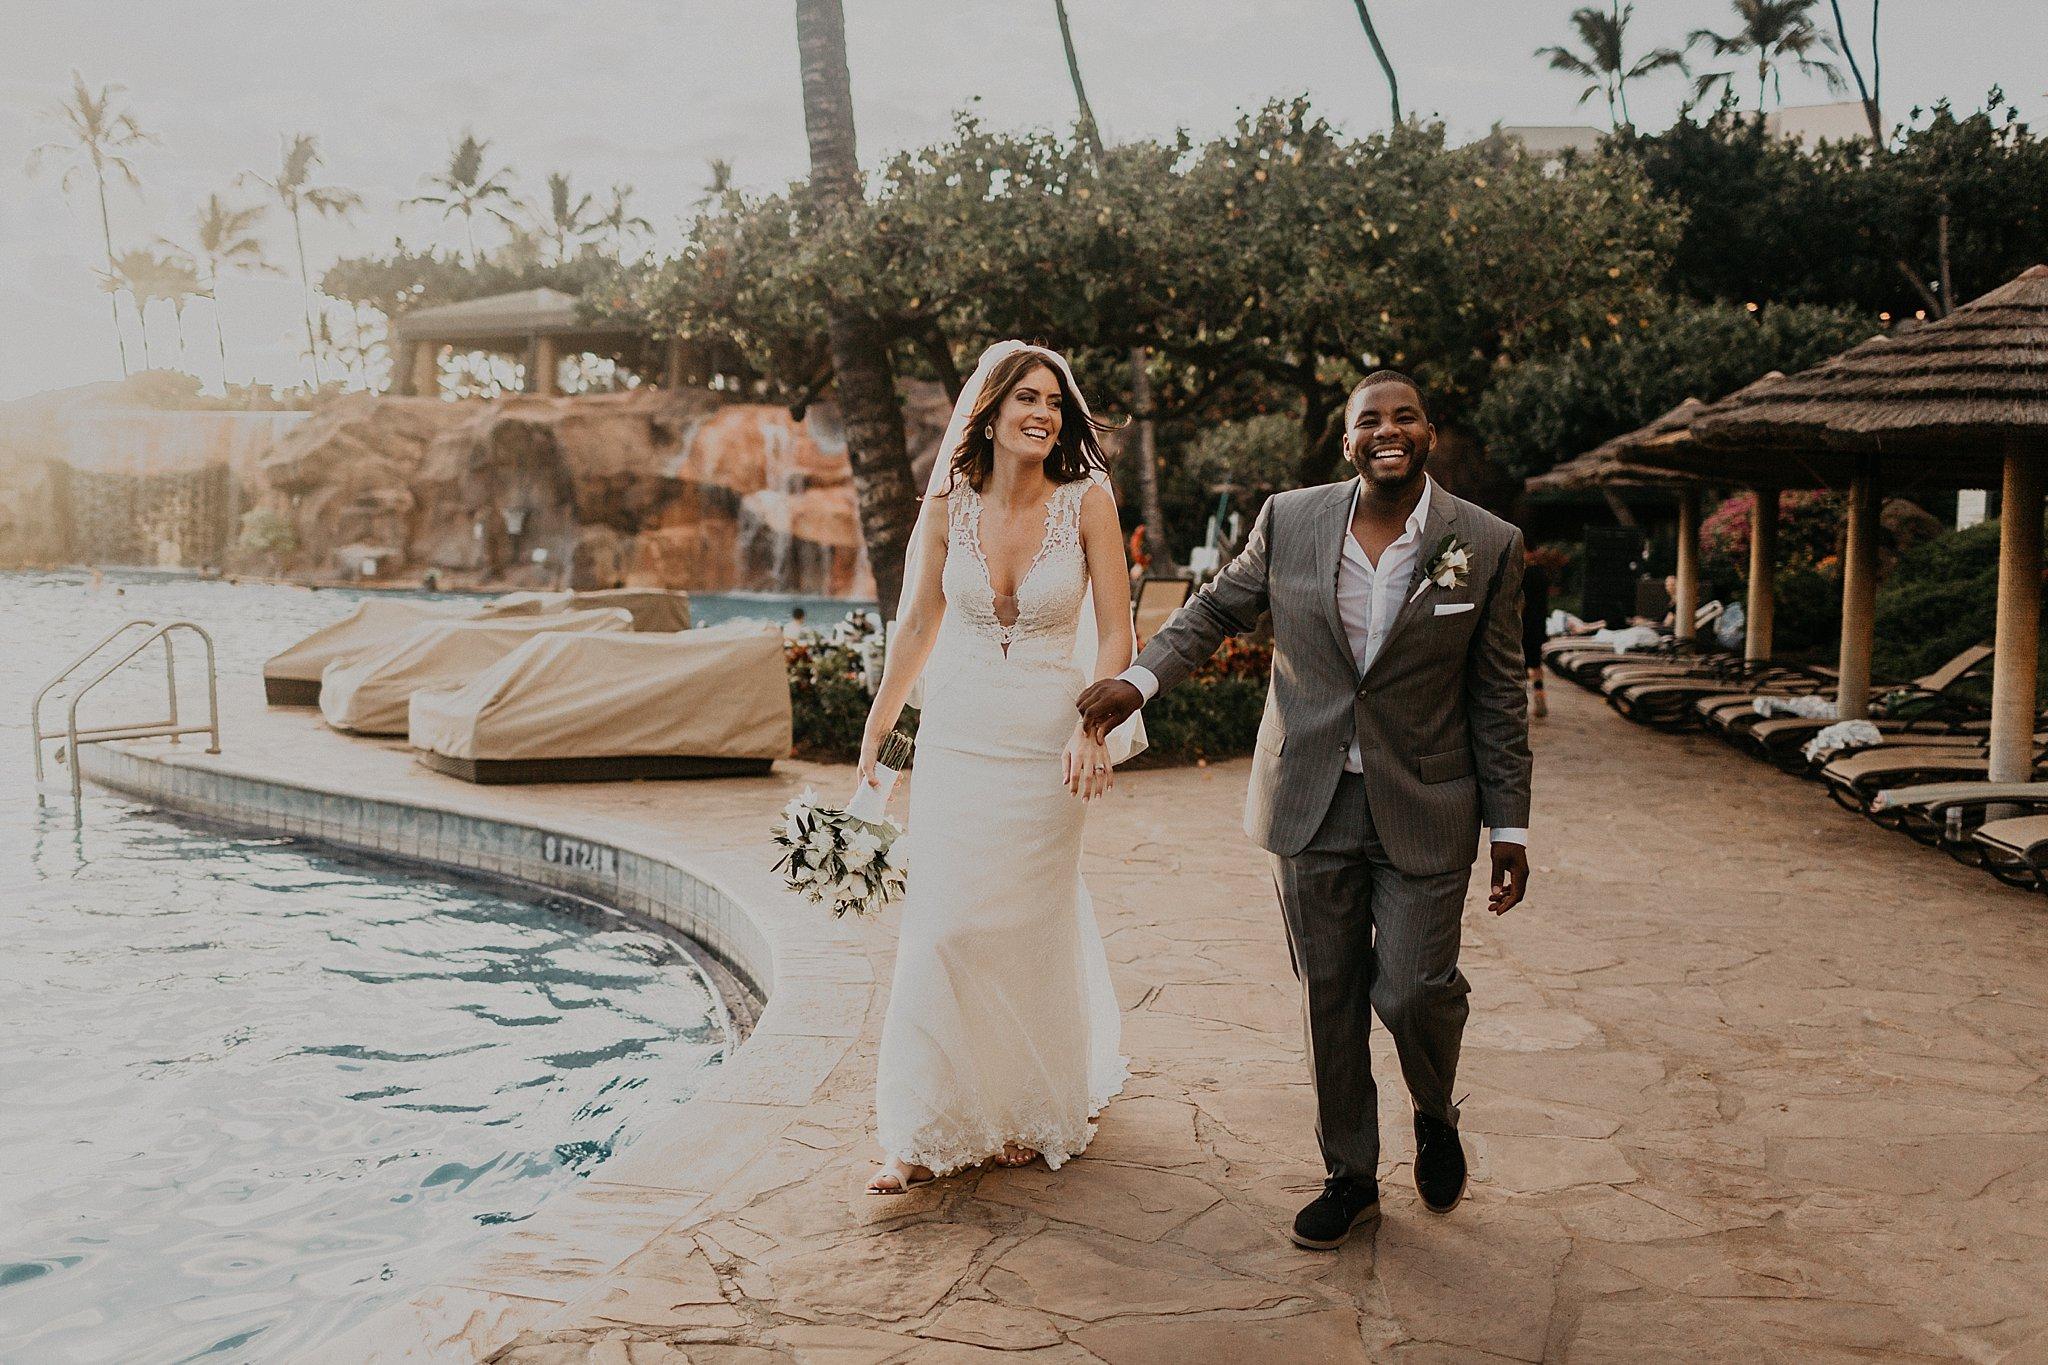 samantha_mcfarlen_bellingham_washington_engagement_photography_seattle_wedding_photographer_0230.jpg